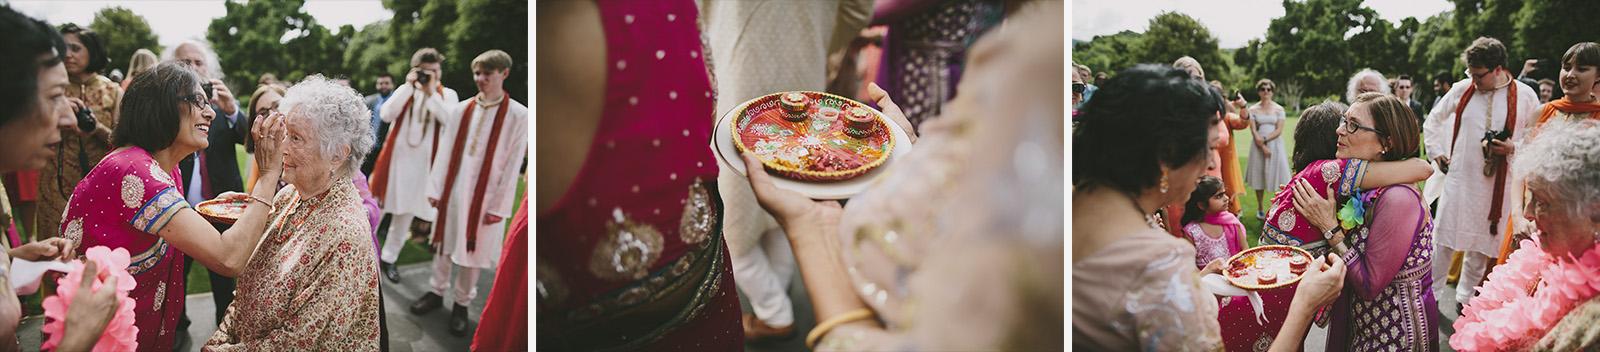 Holman_Ranch_Wedding_Indian_Wedding_035